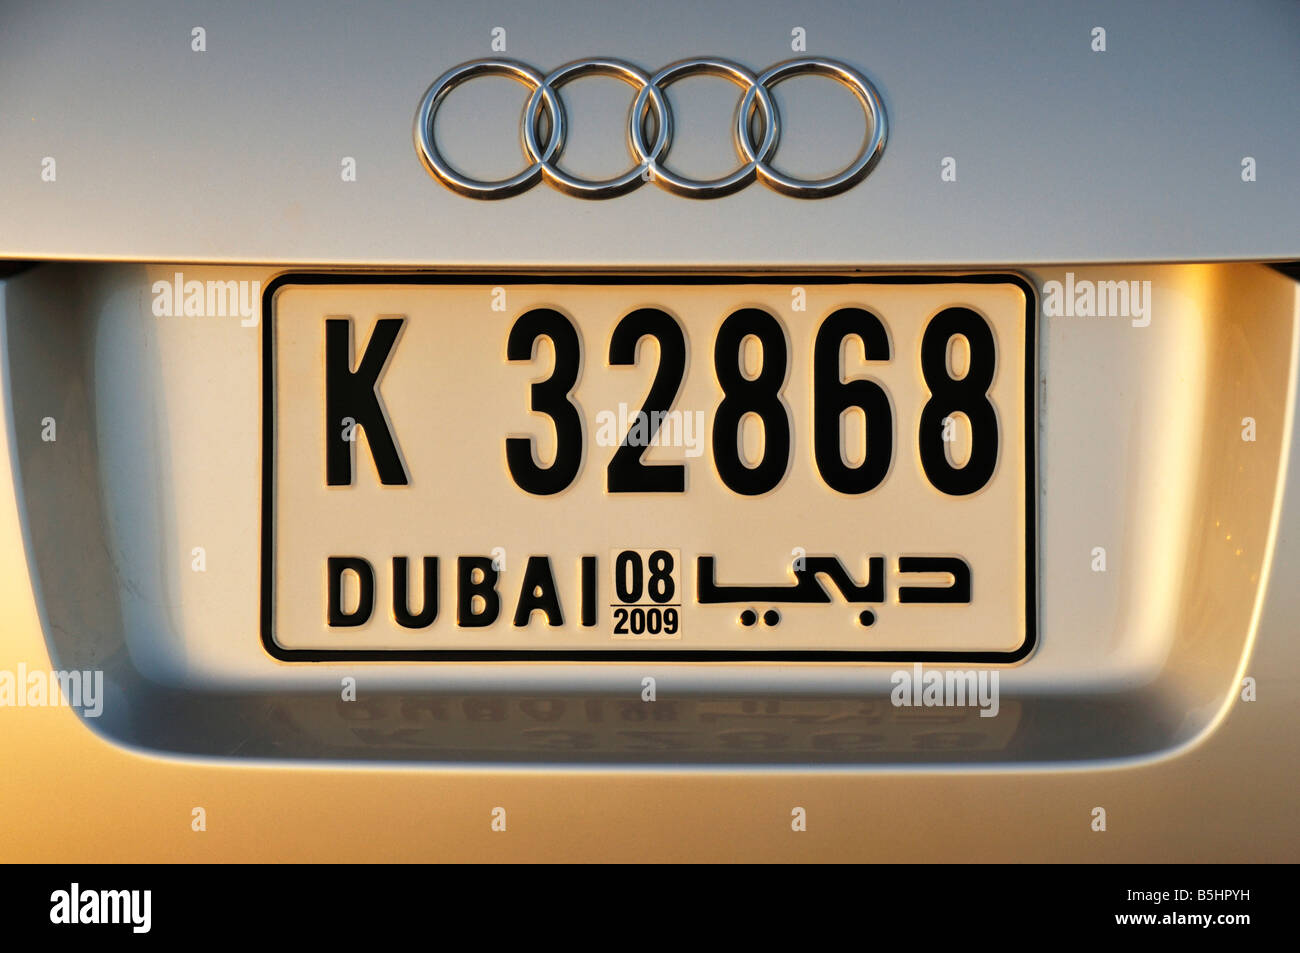 Audi Number Plate Stockfotos & Audi Number Plate Bilder - Alamy